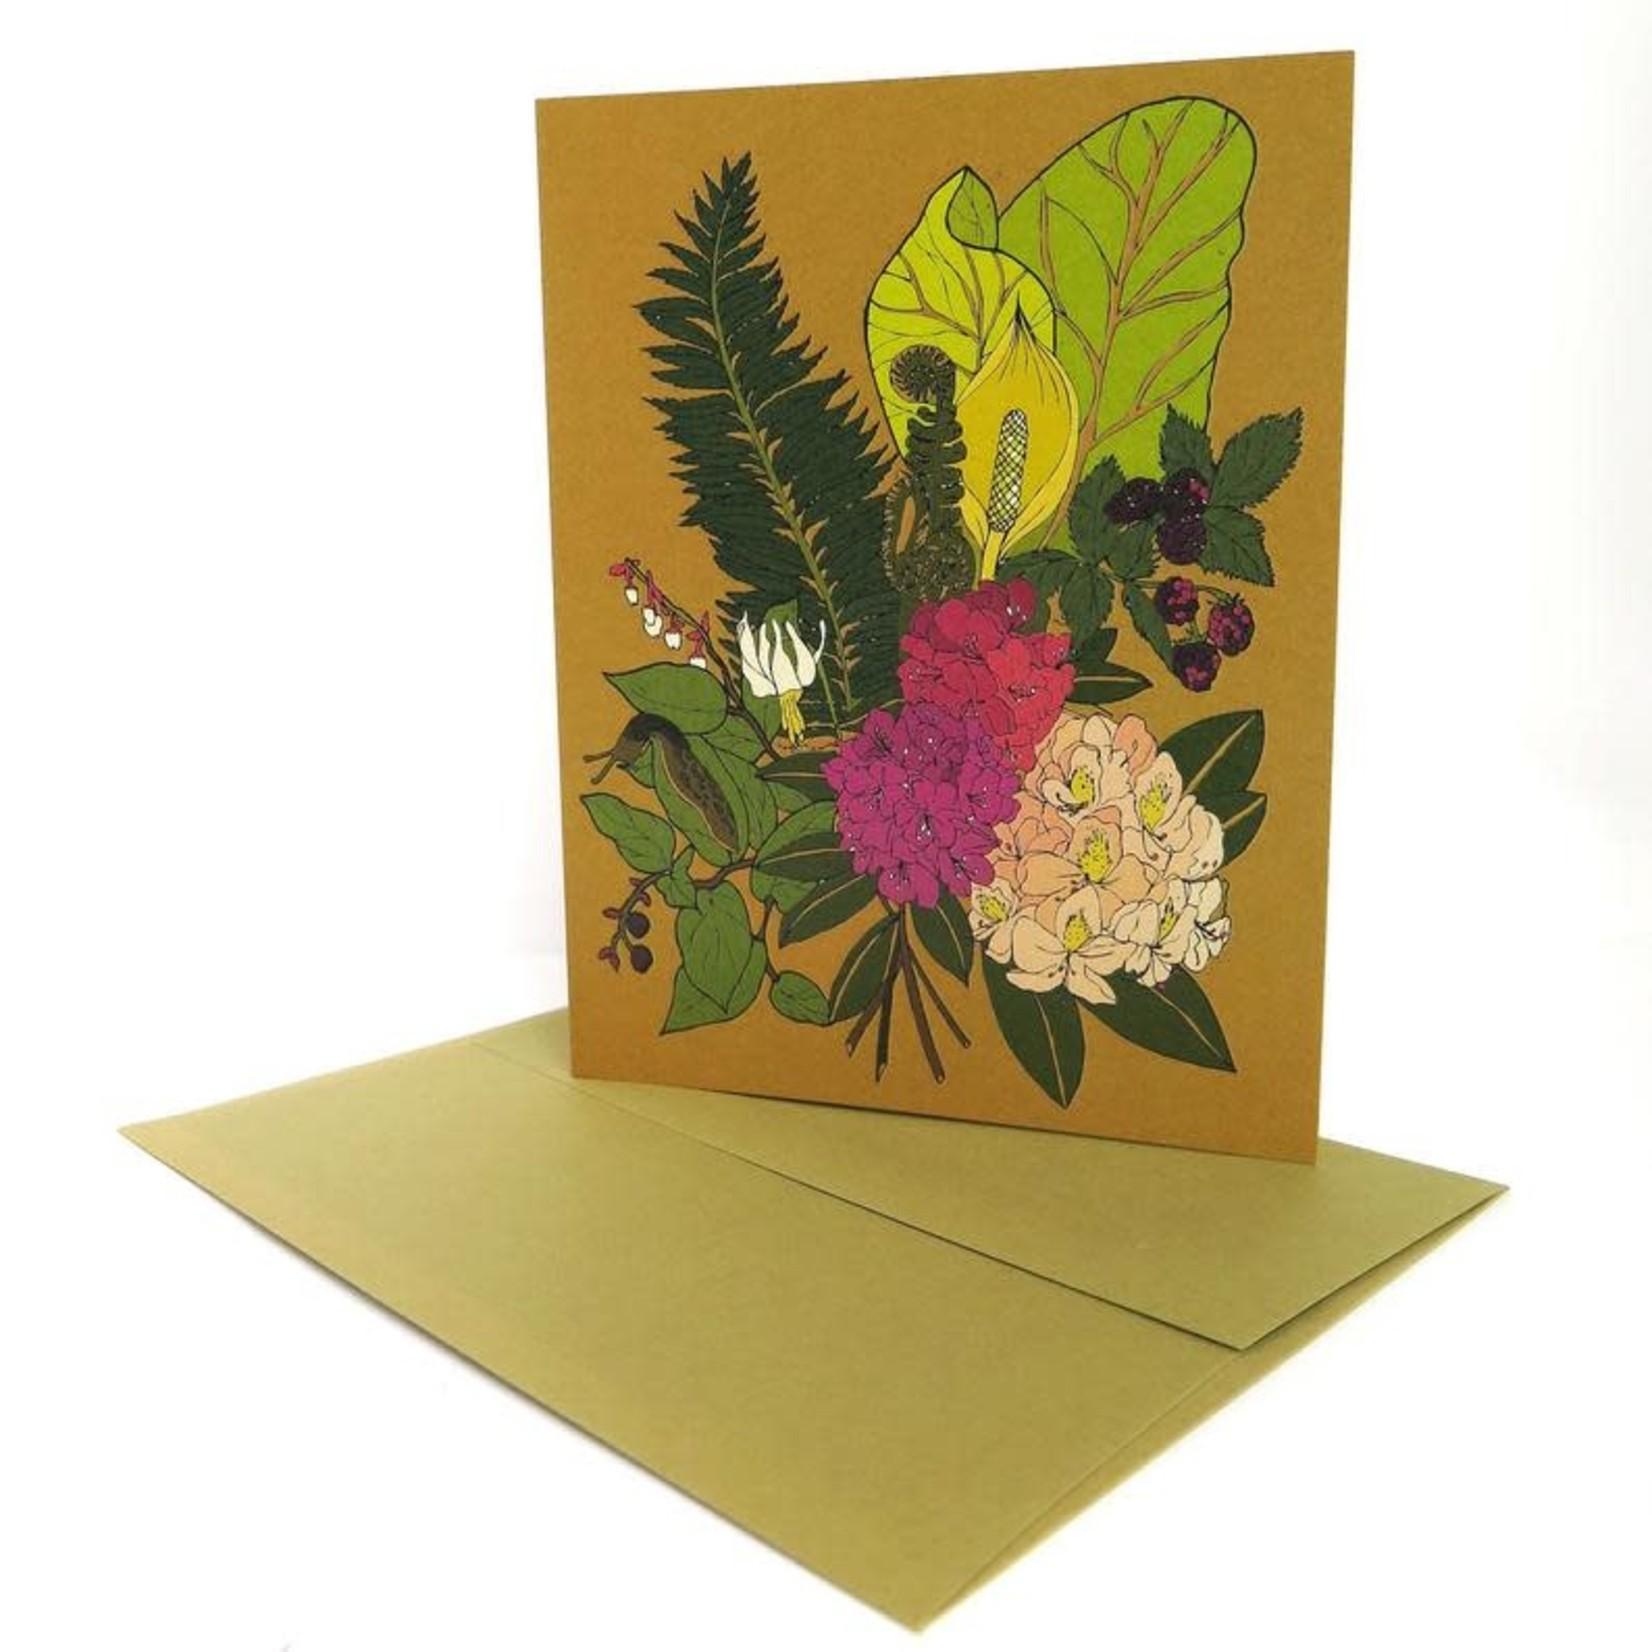 Wild Life Wild Flowers Card